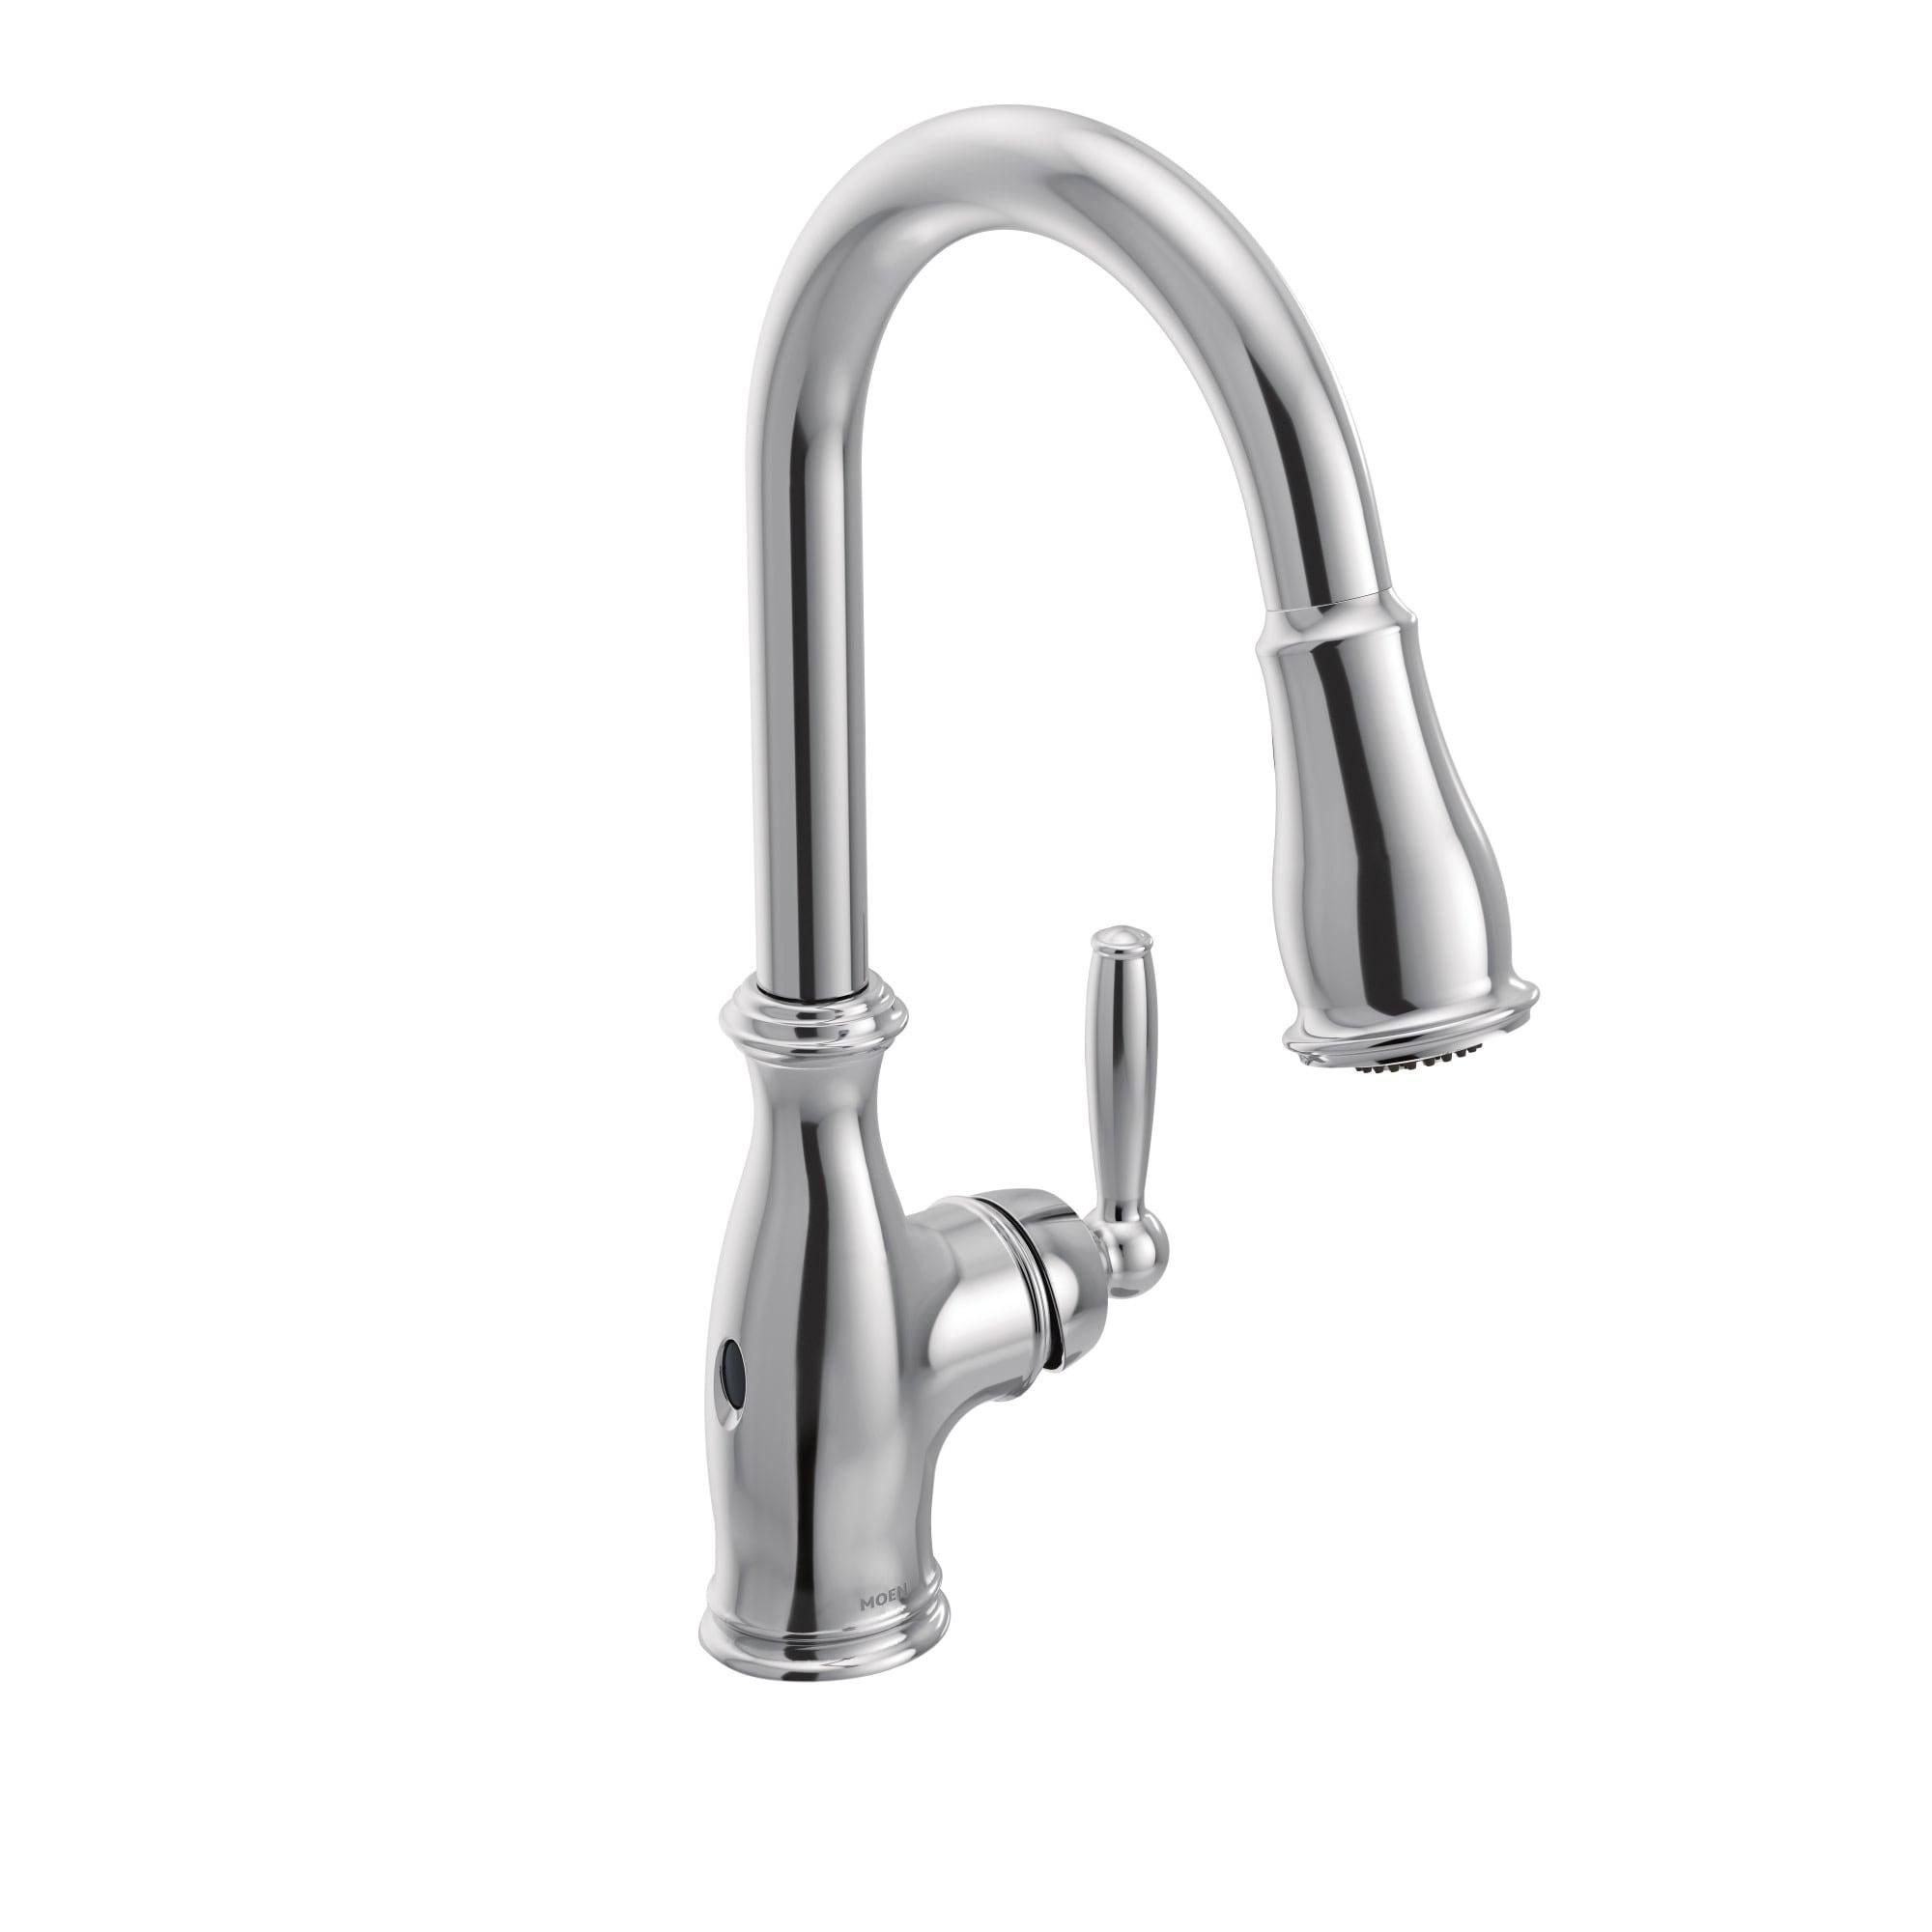 Moen 7185ew Brantford 1 5 Gpm Single Hole Pull Down Kitchen Faucet With Duralast Duralock Motionsense Powerclean And Reflex